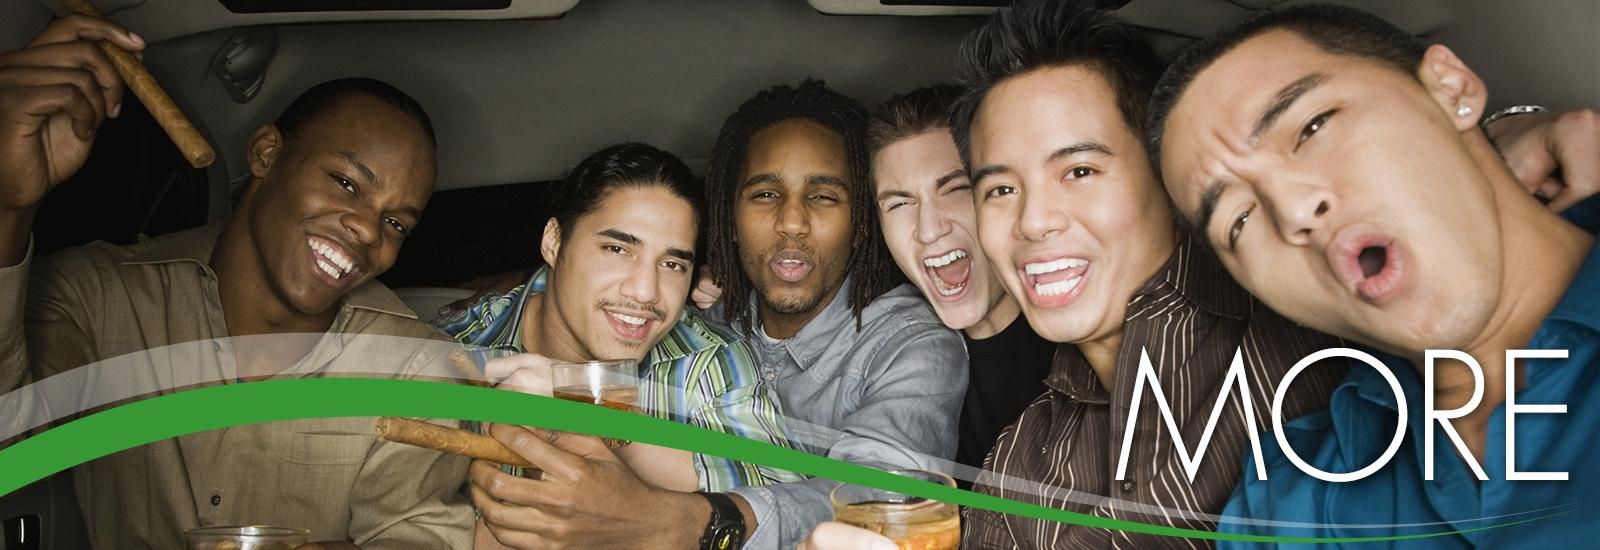 10 Elegant Last Minute Bachelor Party Ideas atlantic city bachelor party tropicana casino resort 2020